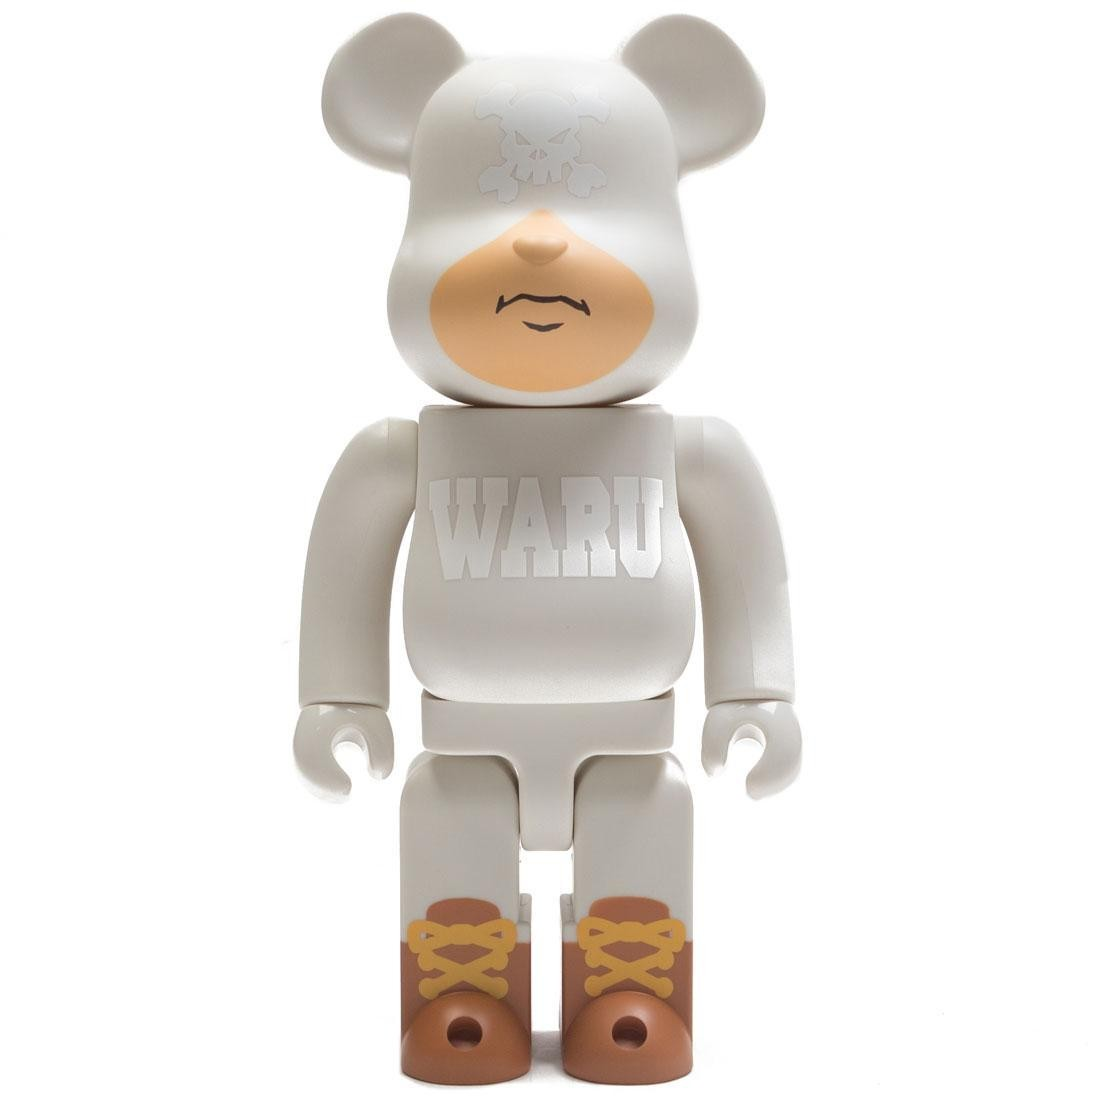 Medicom Santastic! Entertainment Tokyo Tribe Waru 400% White Bearbrick Figure (white)